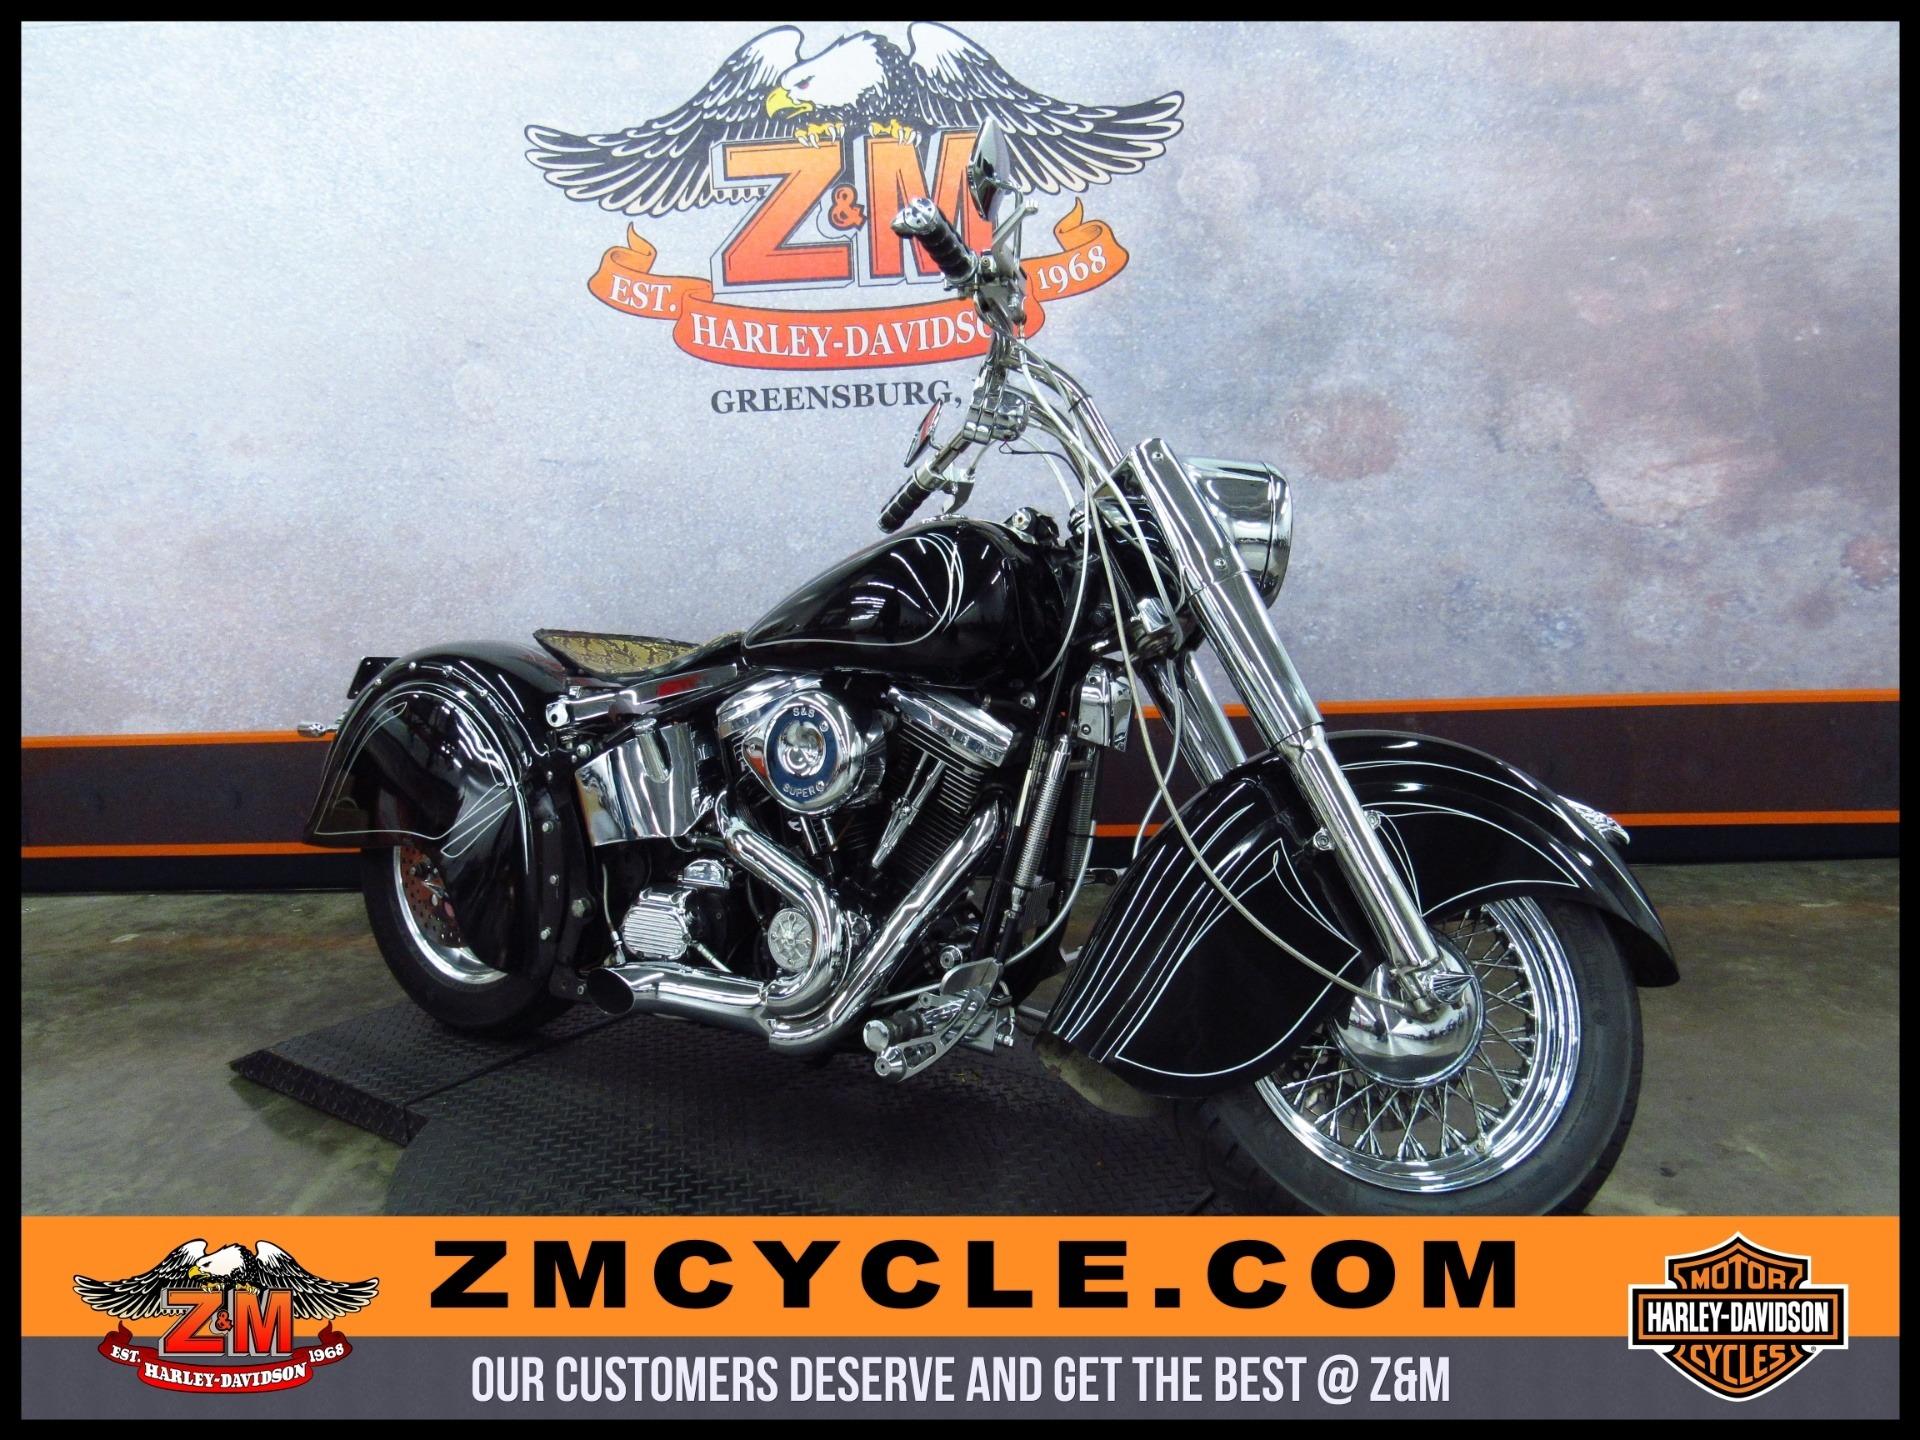 1996 Street Rider